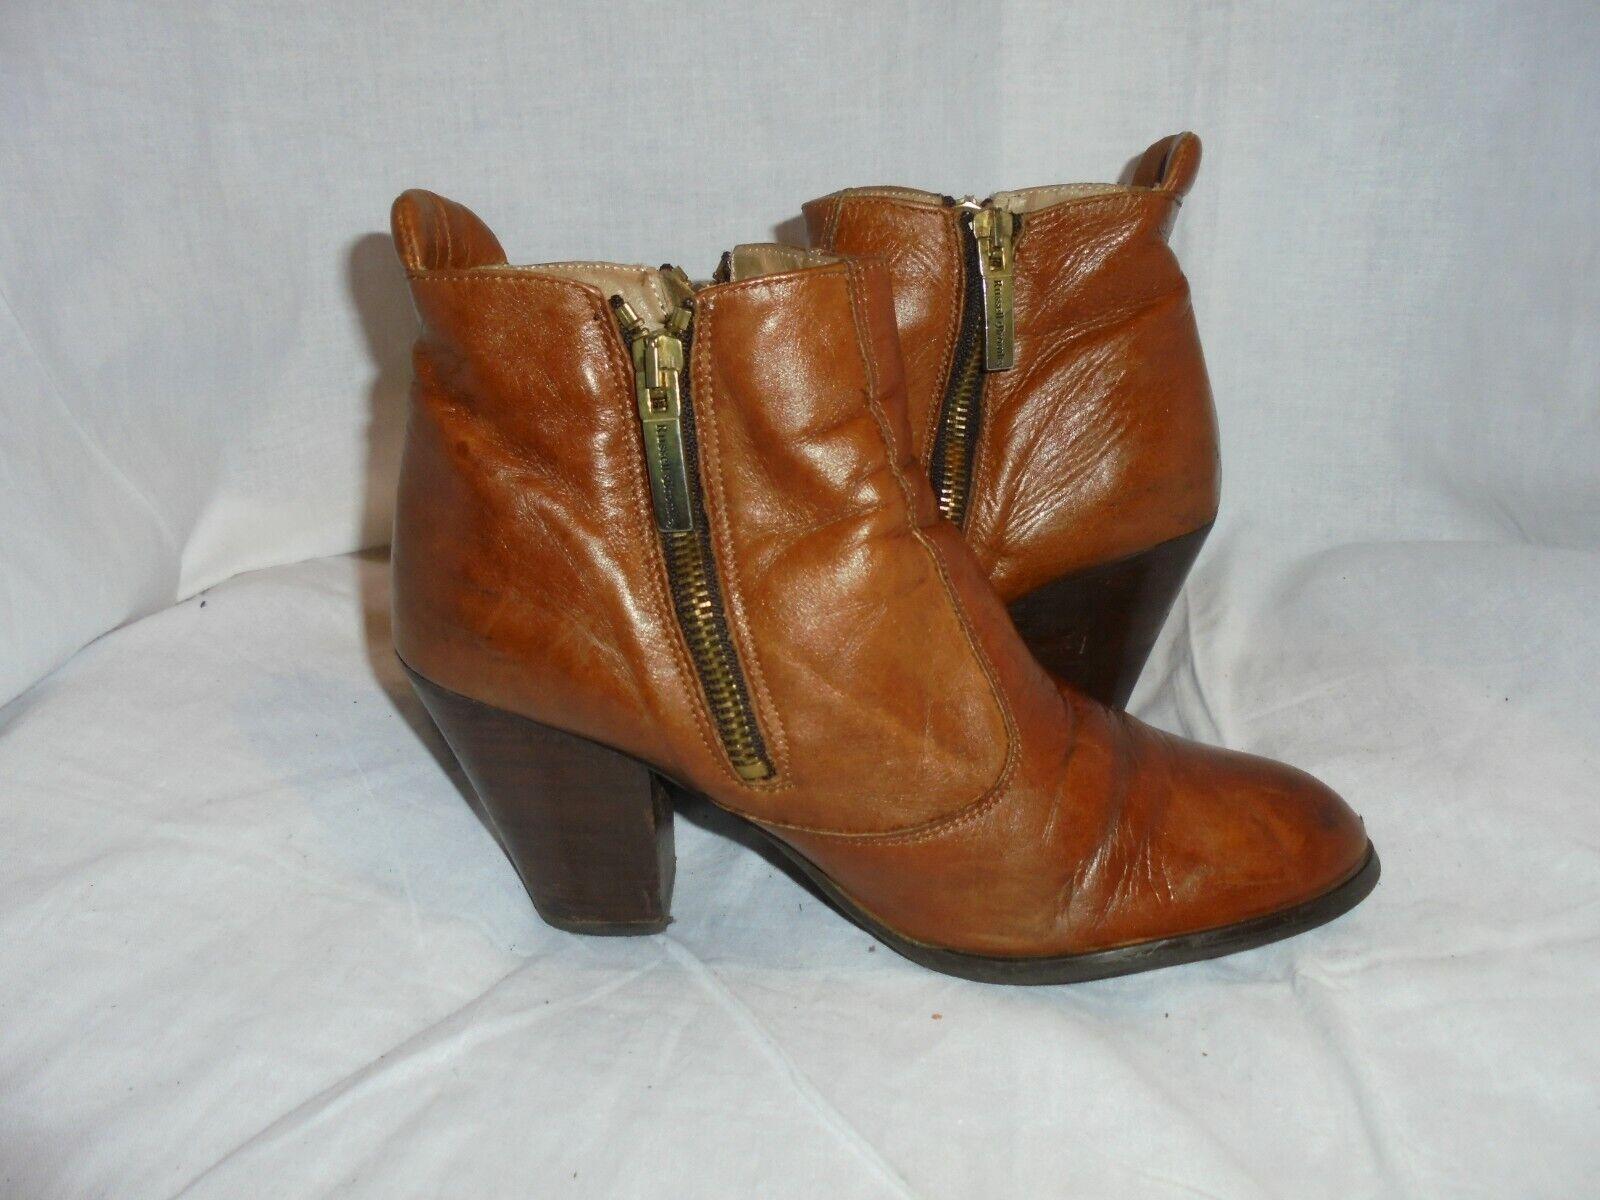 Camper K400228-003 Wanda Brown Leather Zip Ankle Boot Shoe